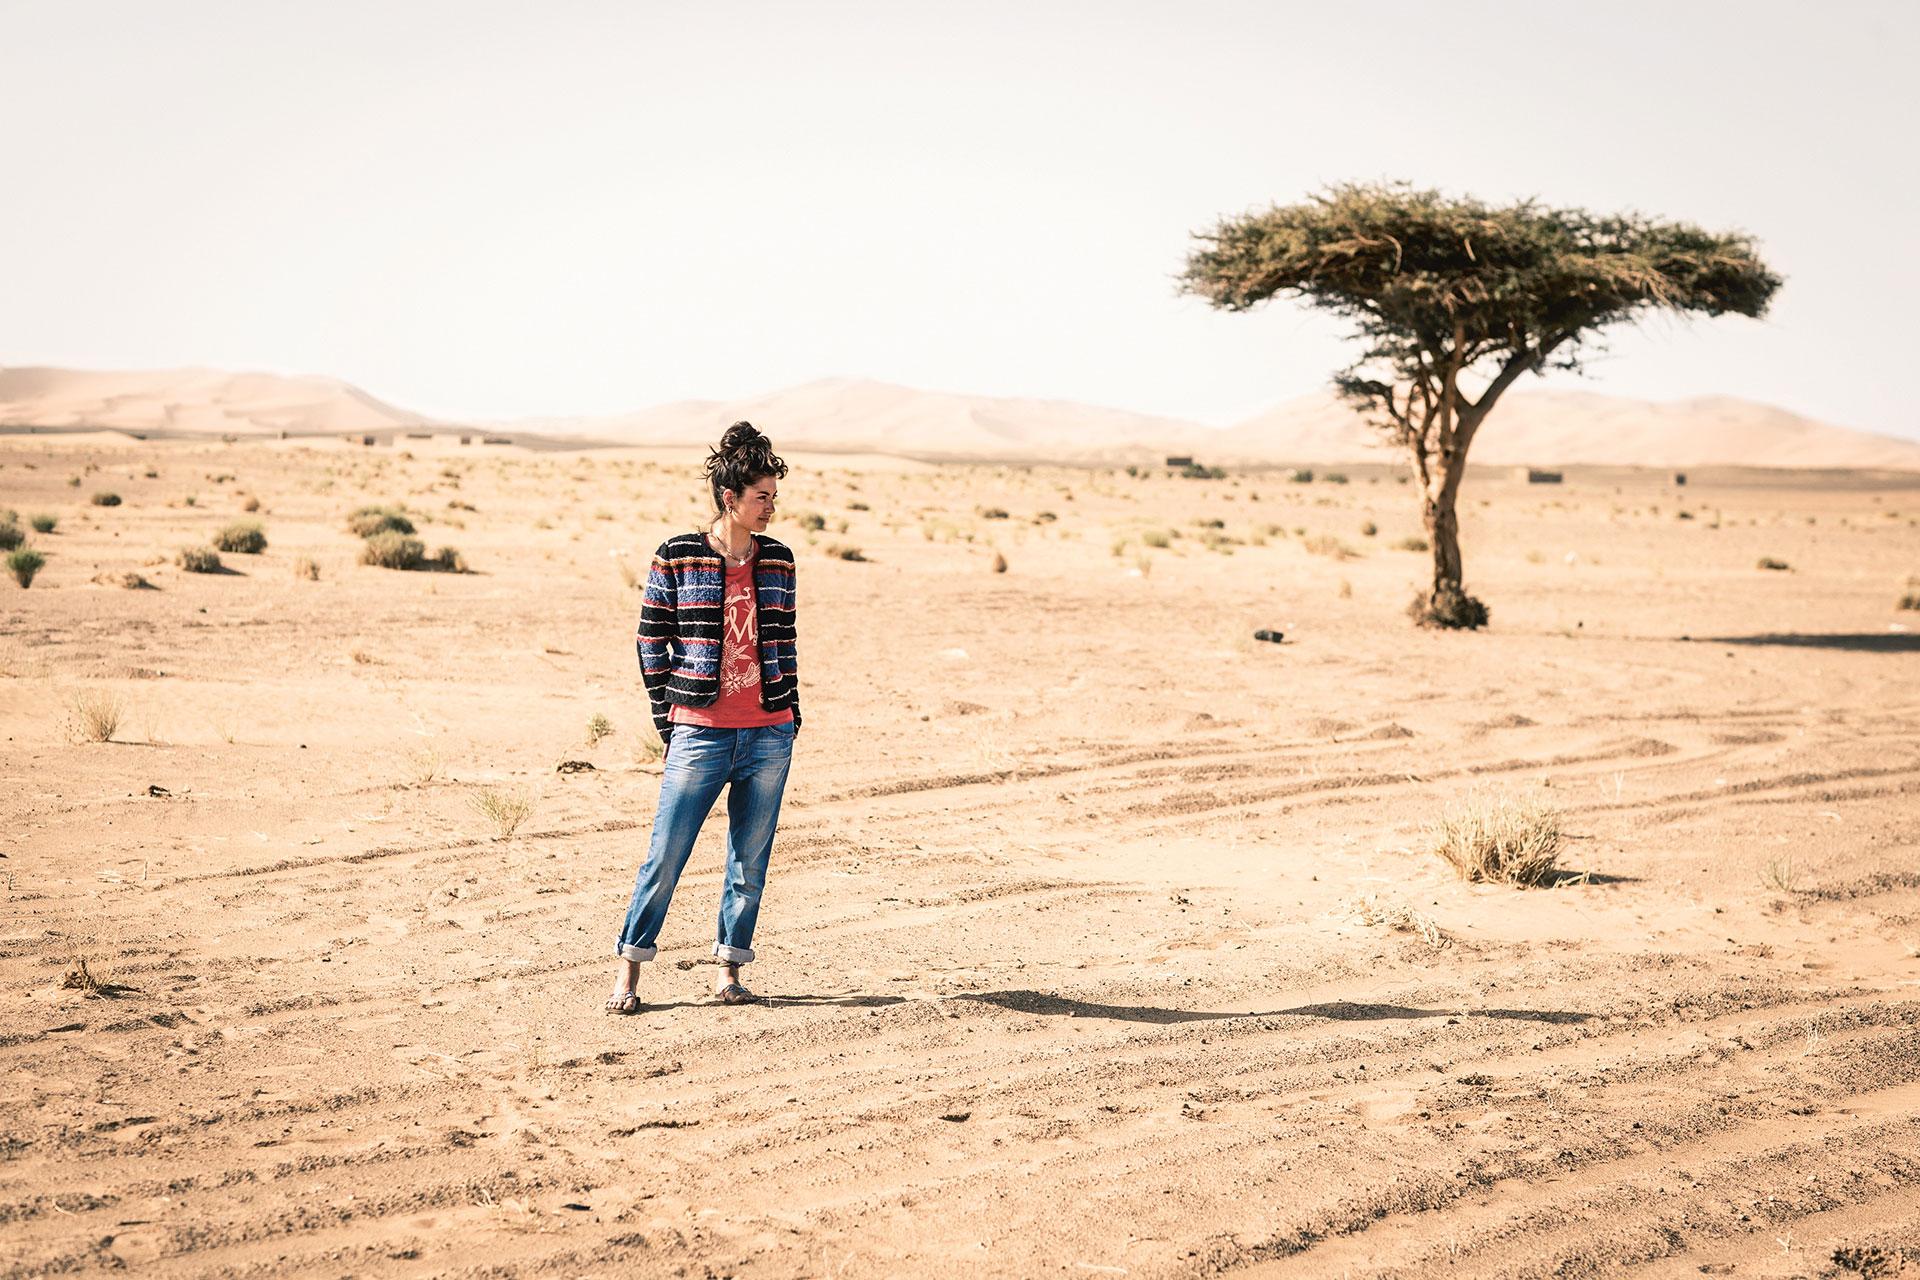 Lifestyle Outdoor People Fotograf Streetwear Travel Marokko Sahara Berlin Deutschland